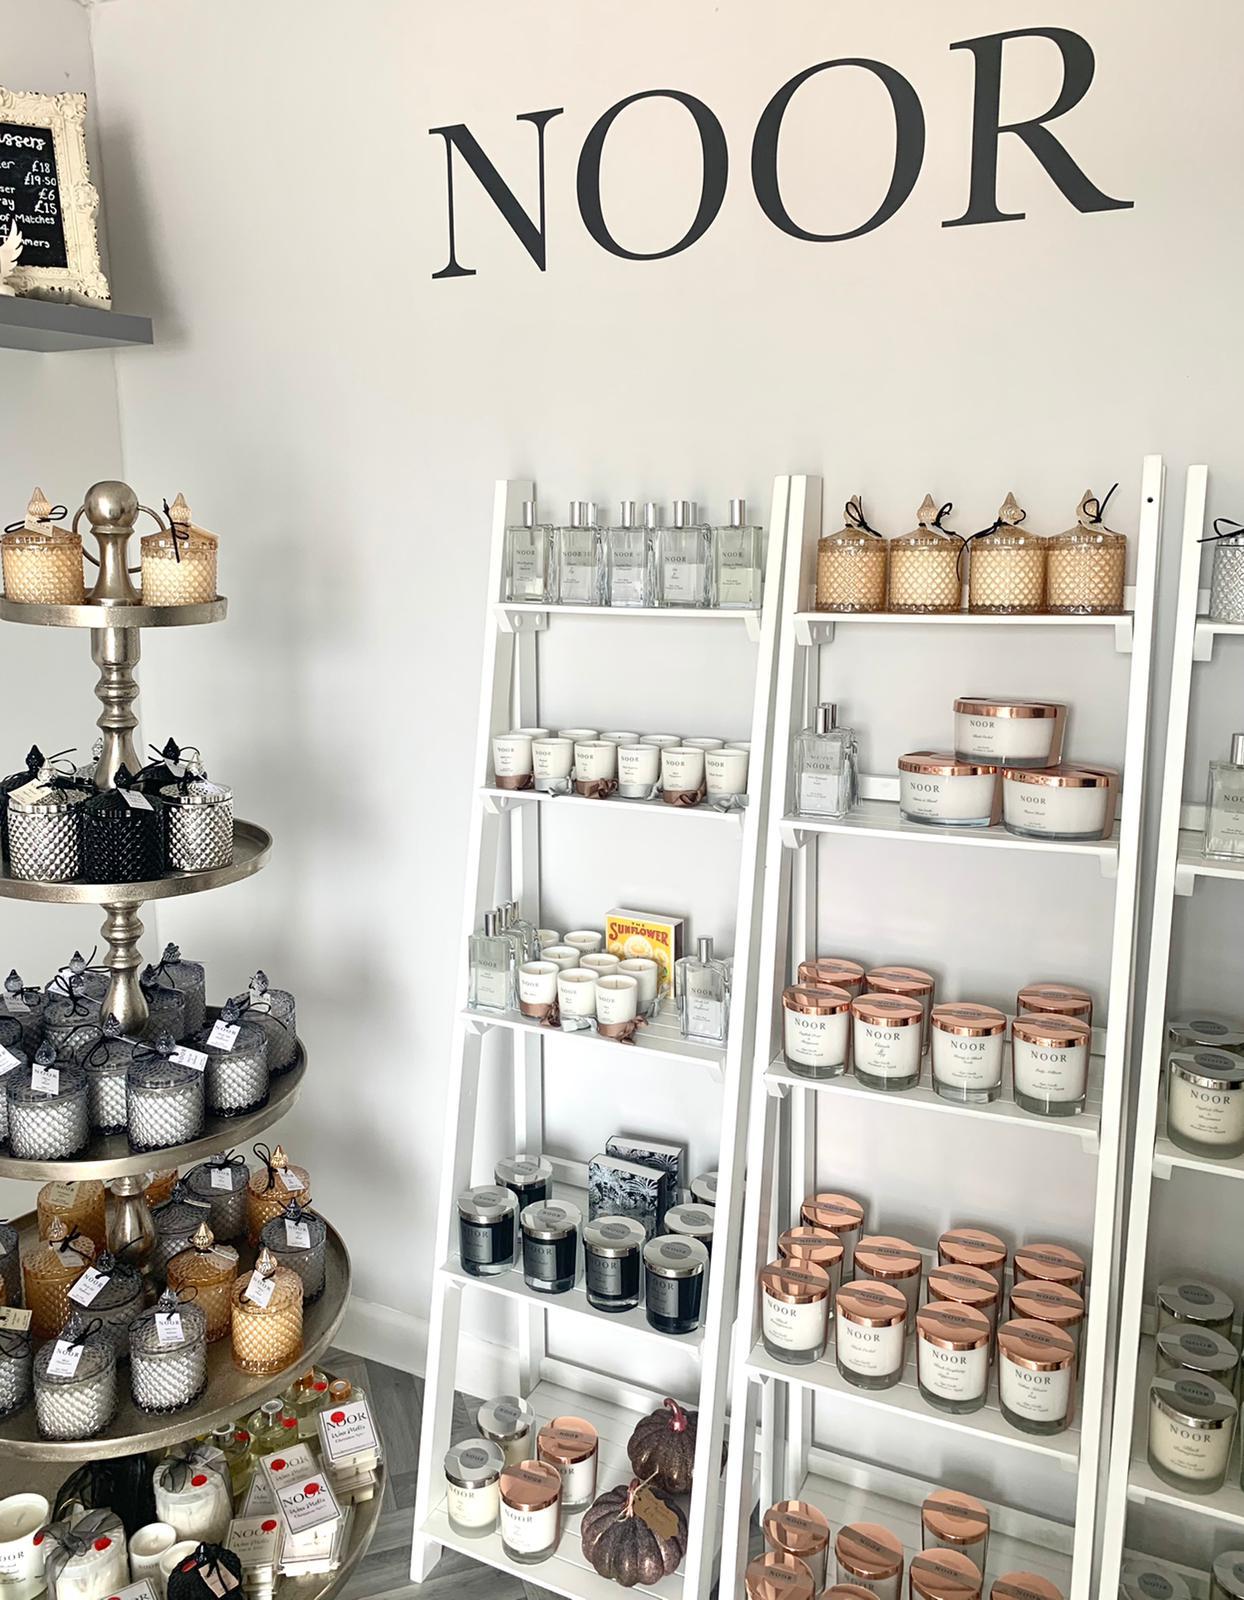 Luxury Candle Supplier Showroom